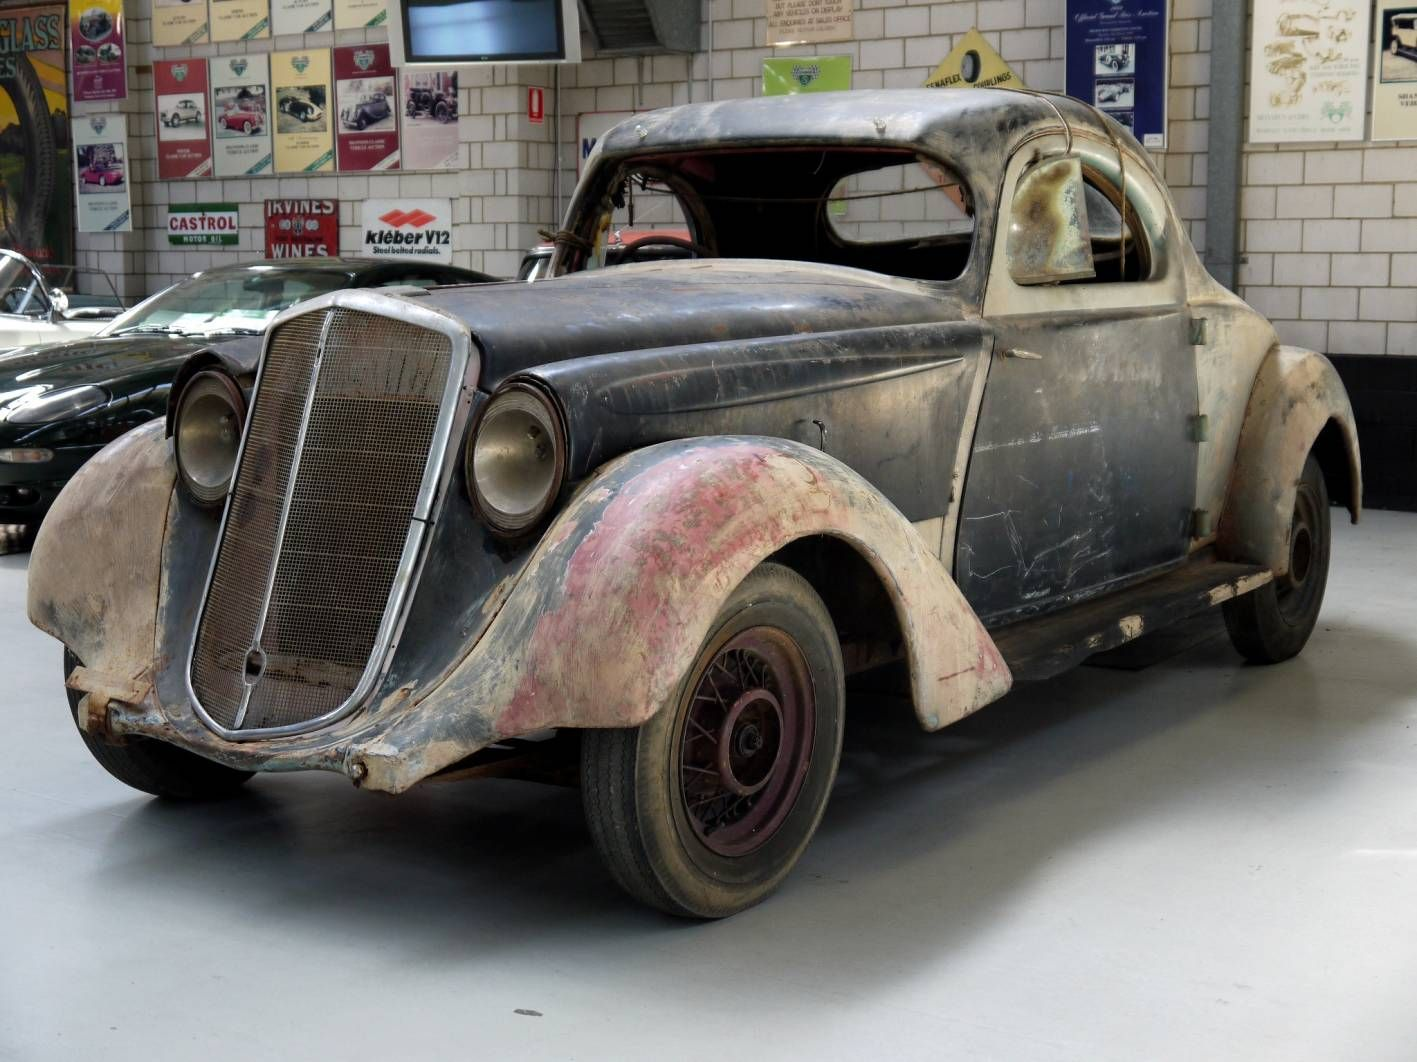 1934 Hupmobile Http Www Theautochannel Com News 2012 02 14 025171 Rare 1934 Hupmobile For Shannons Melbourne Autumn Auction 1 Lg Jpg Carros Motos Auto